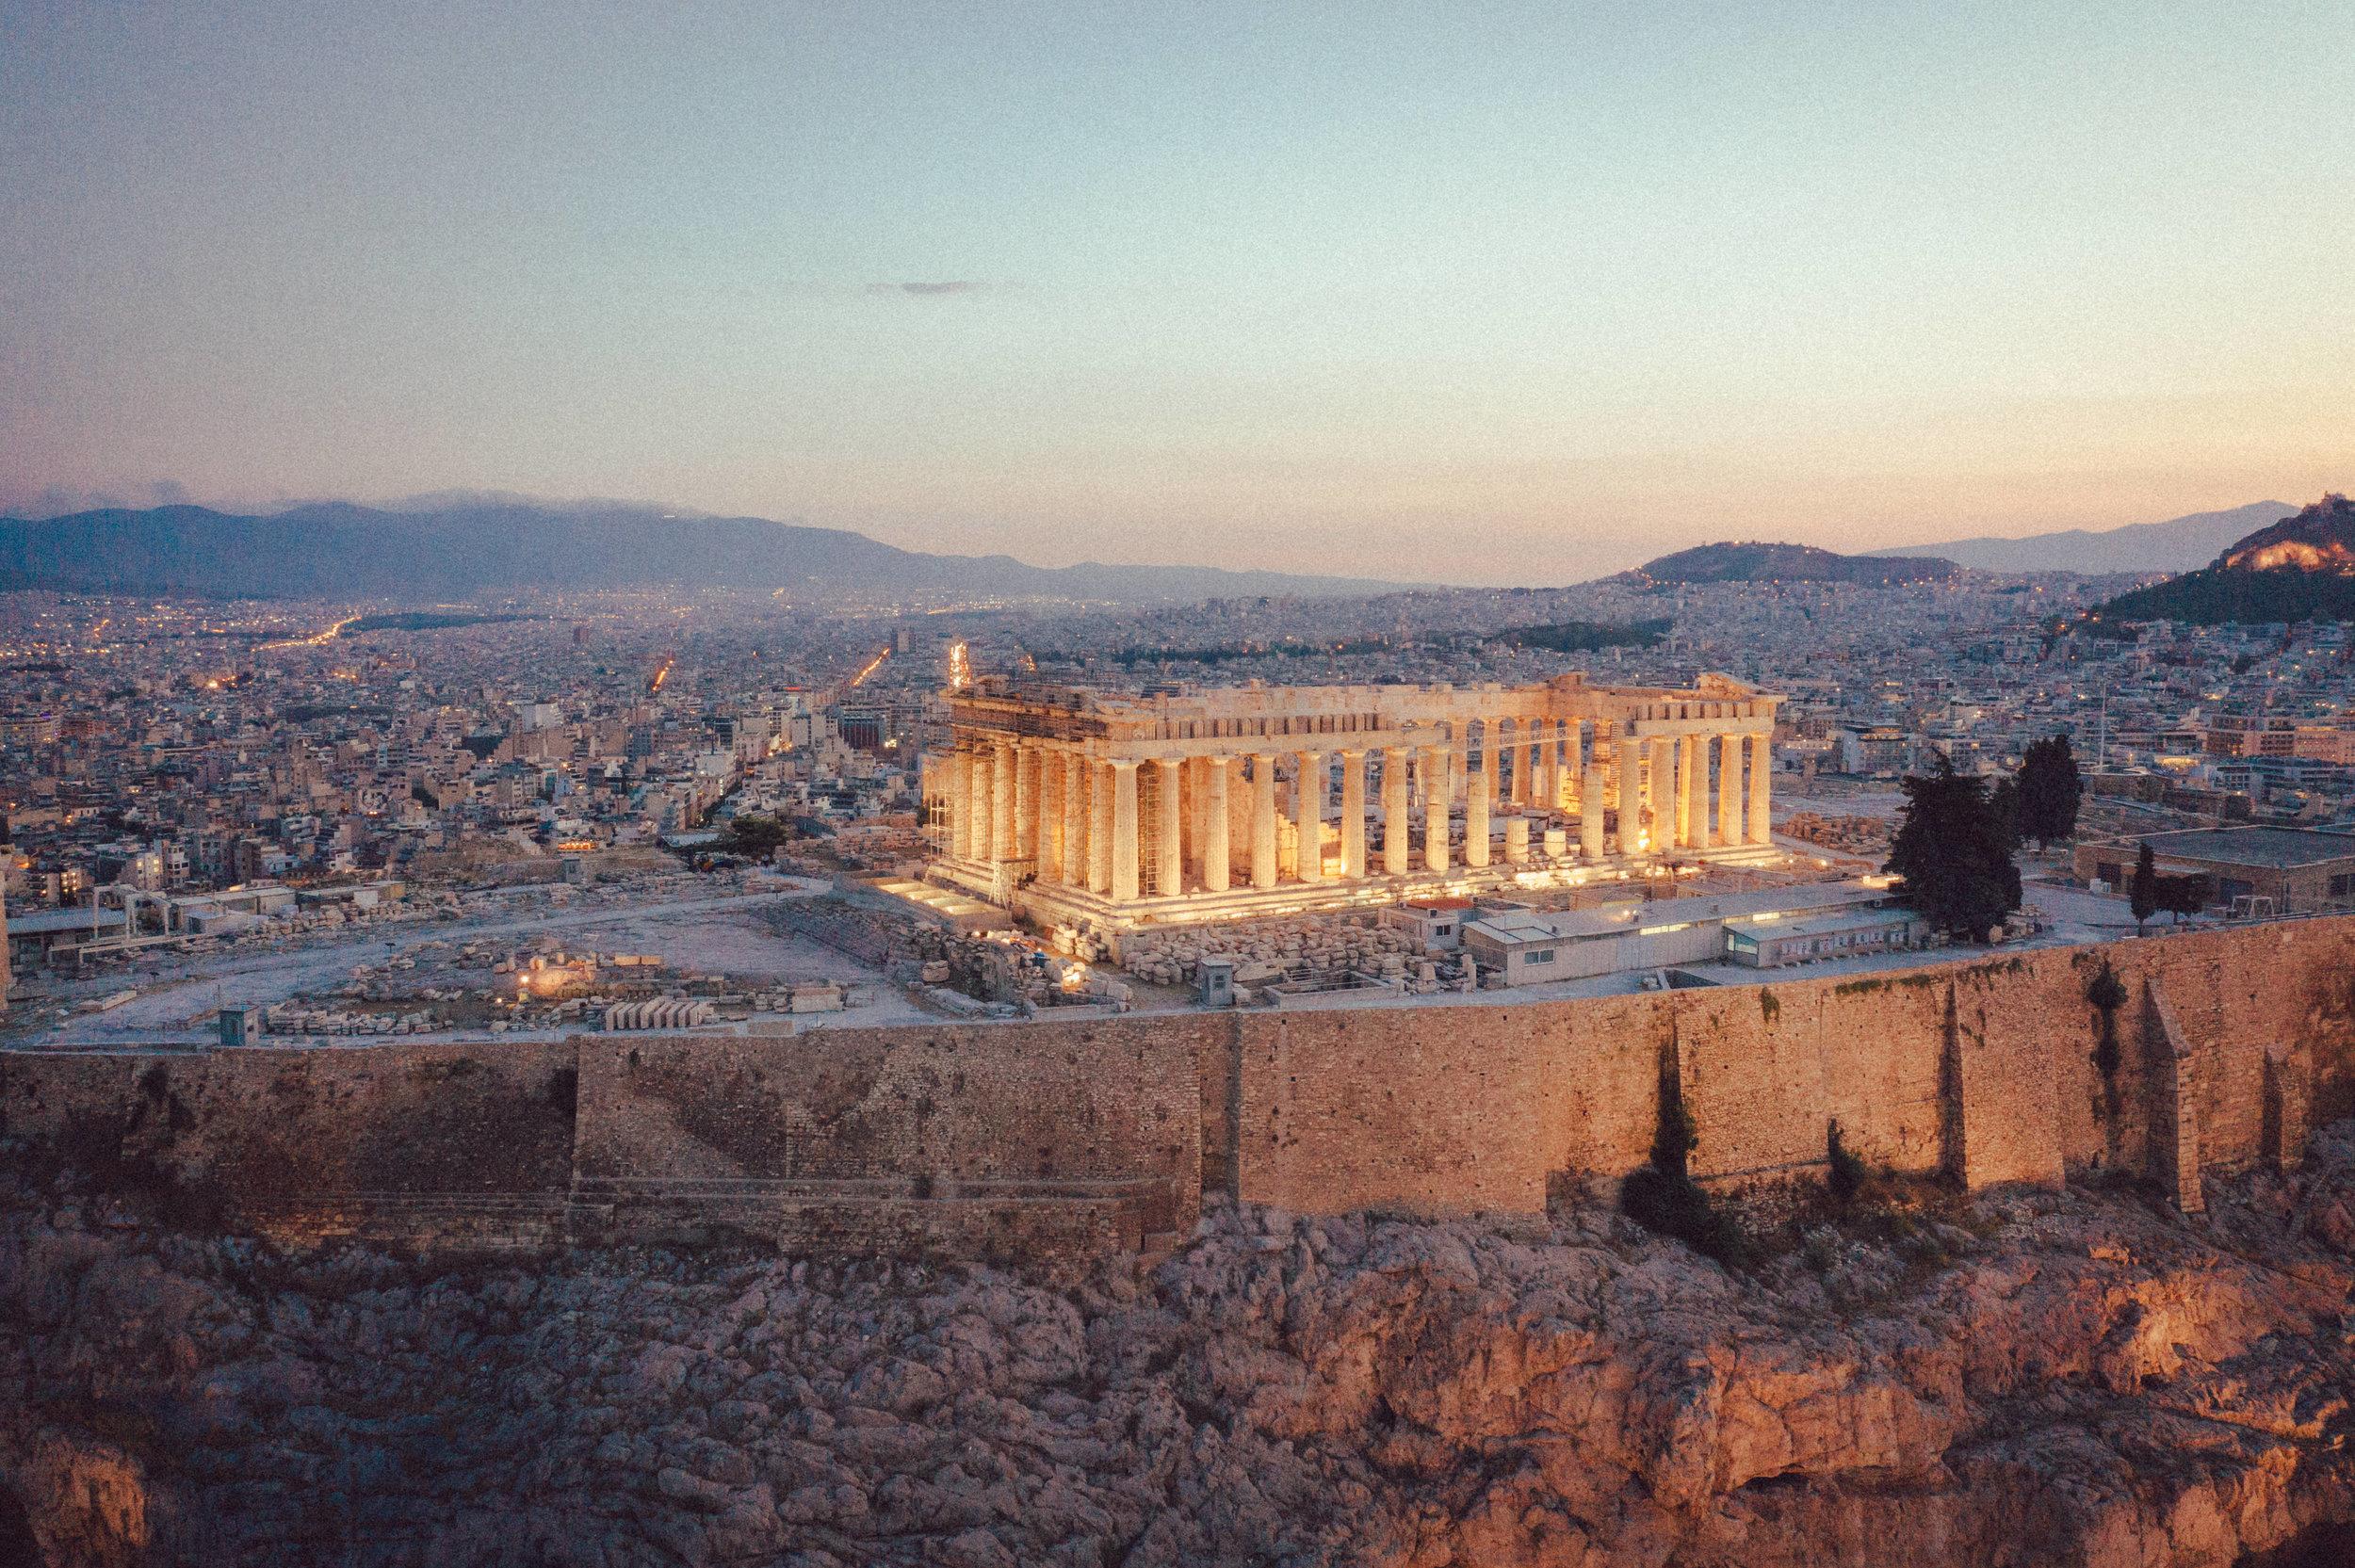 Acropolis at sunrise